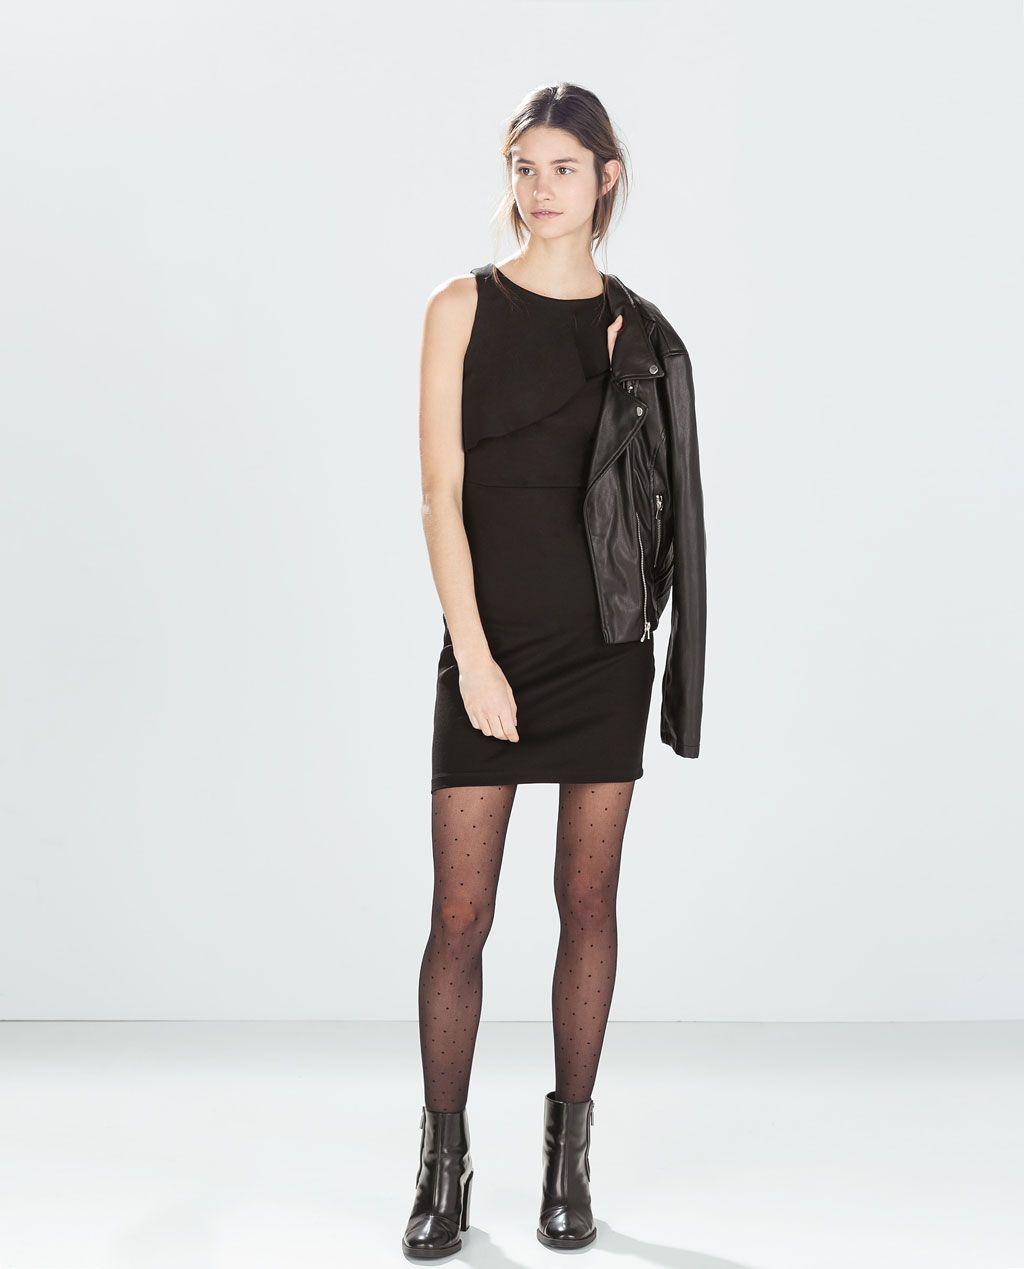 ZARA - WOMAN - DRESS WITH ASYMMETRIC RUFFLE NECK   Beautiful!!